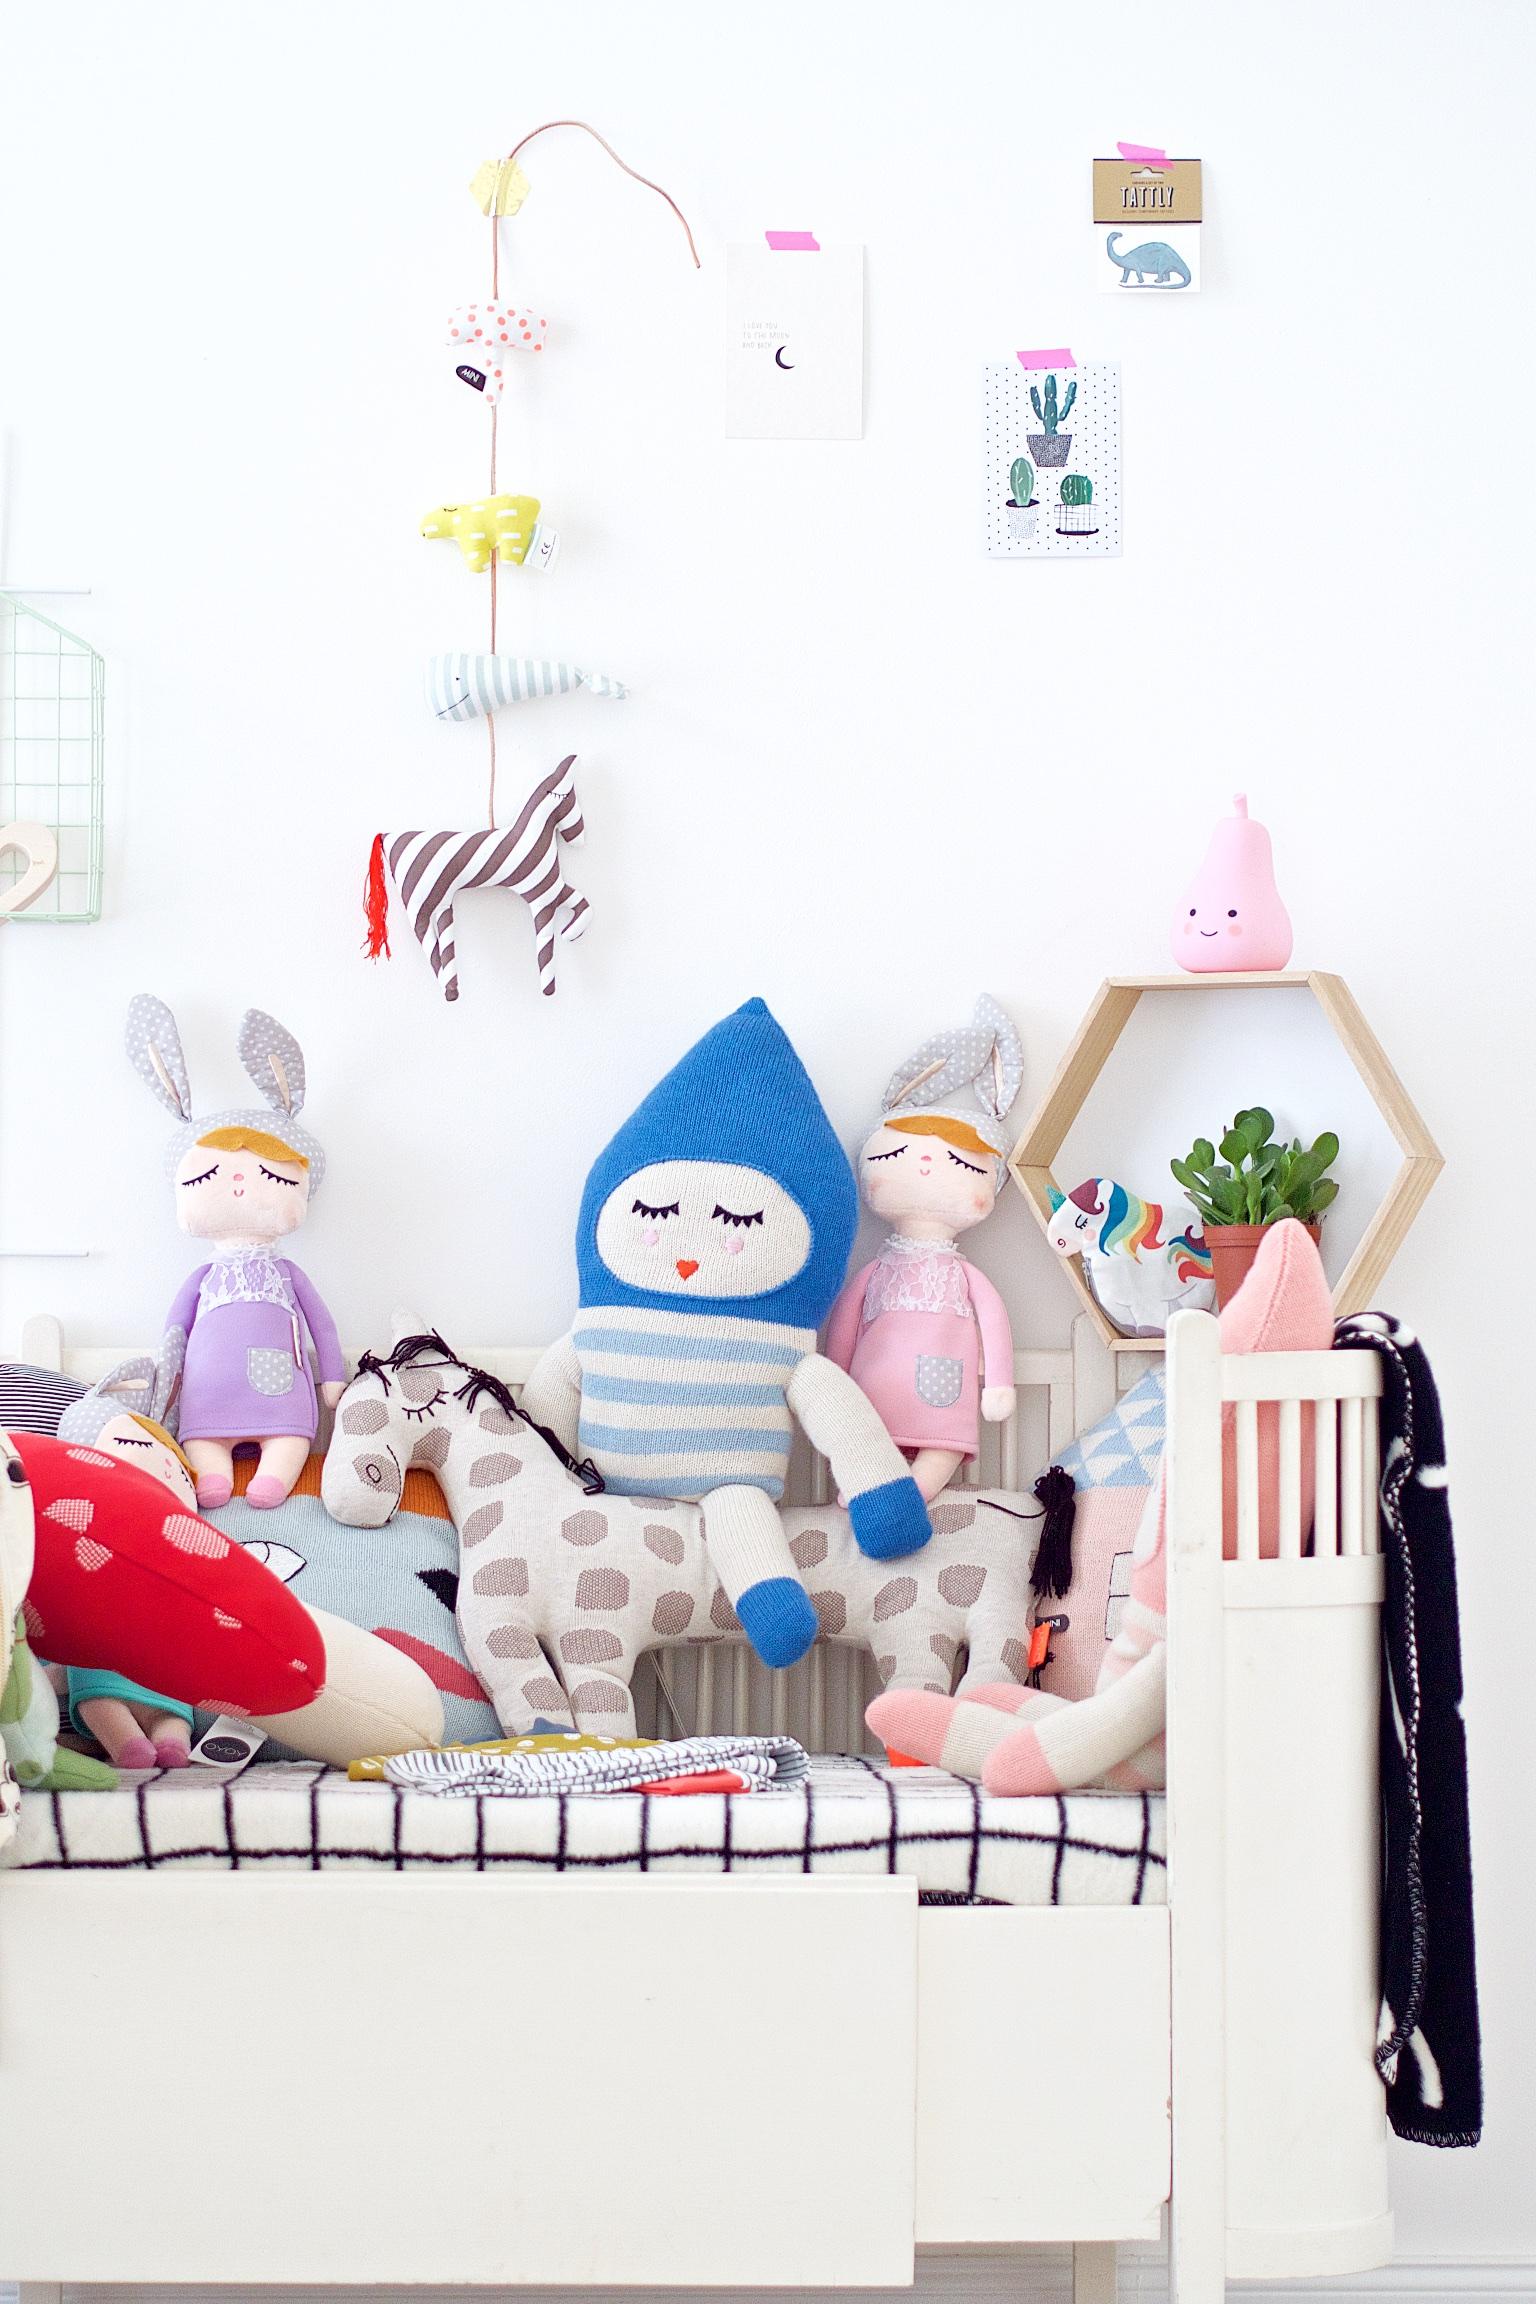 Kinderbett Kili - Pinkepank der Laden